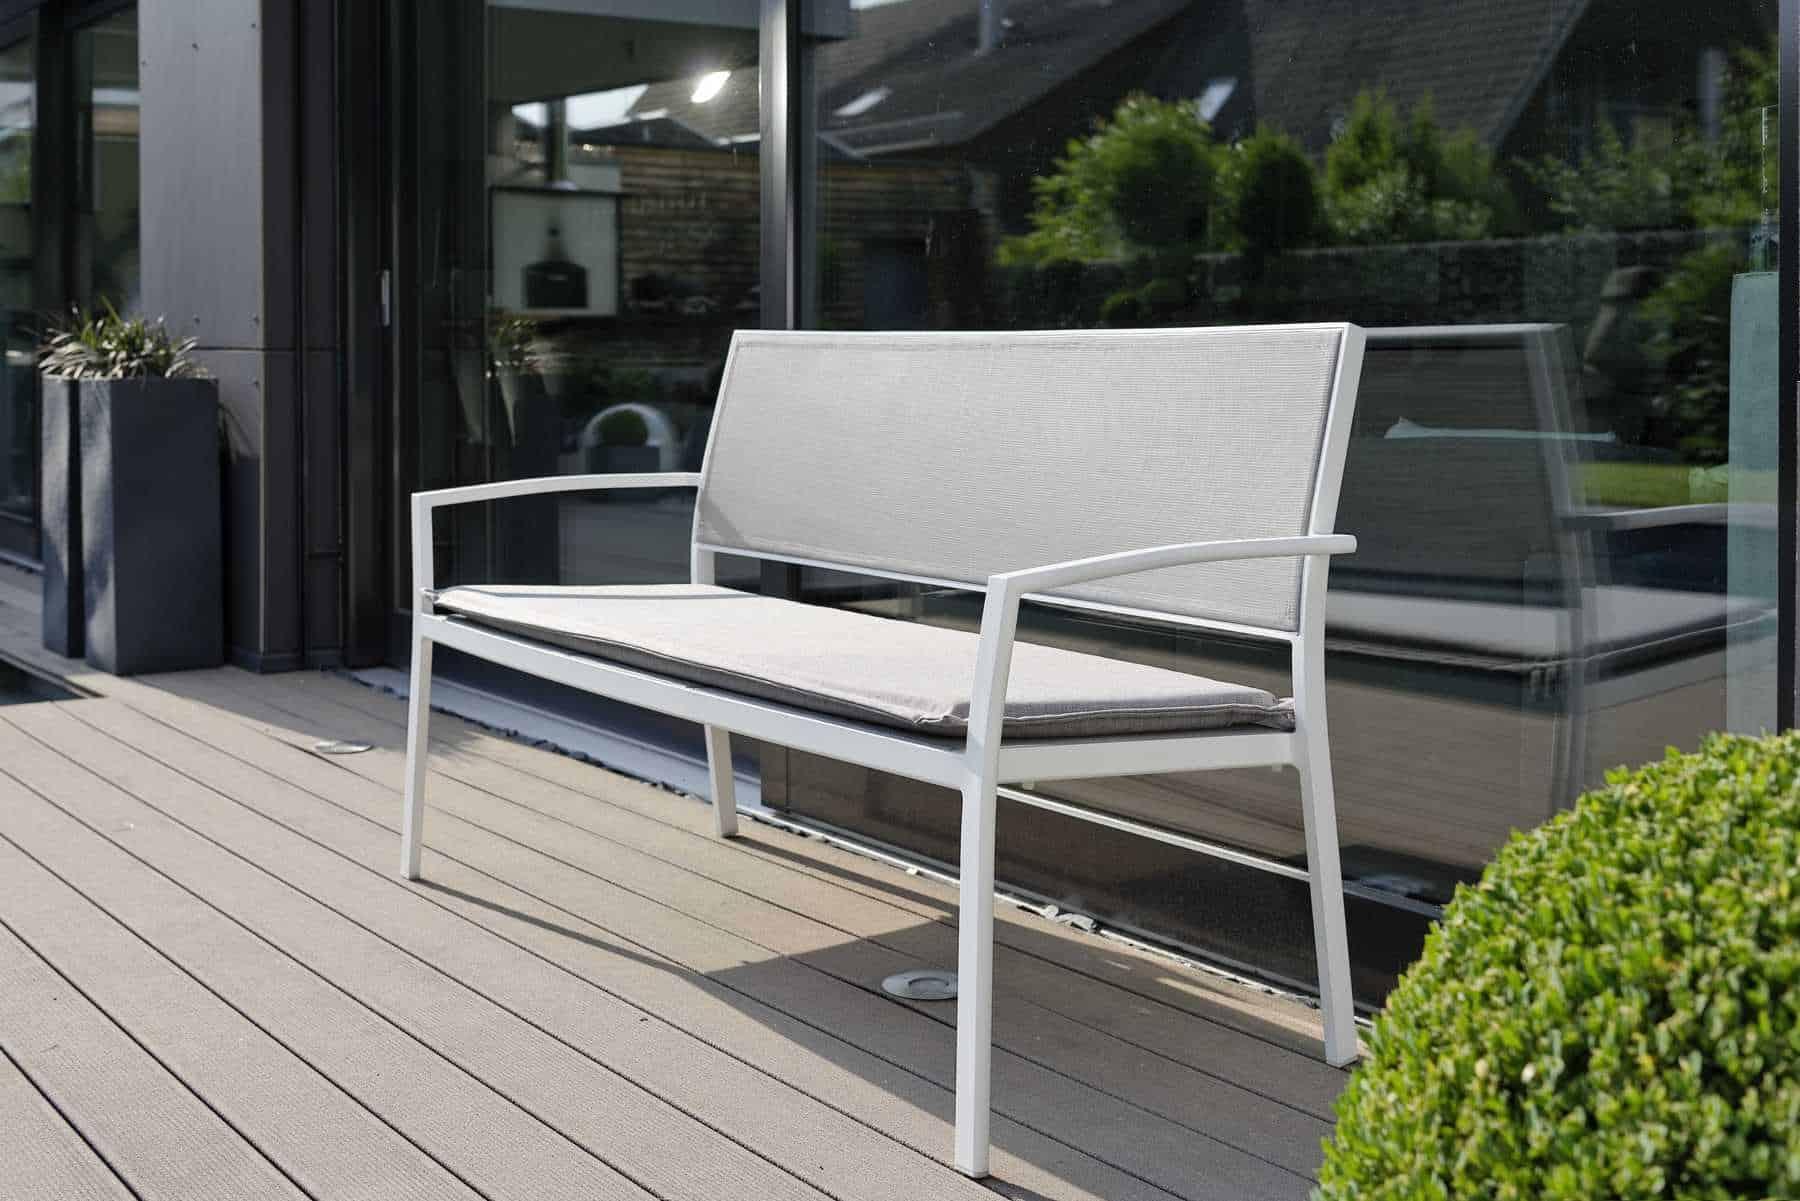 aluminium gartenm bel keil weinheim. Black Bedroom Furniture Sets. Home Design Ideas